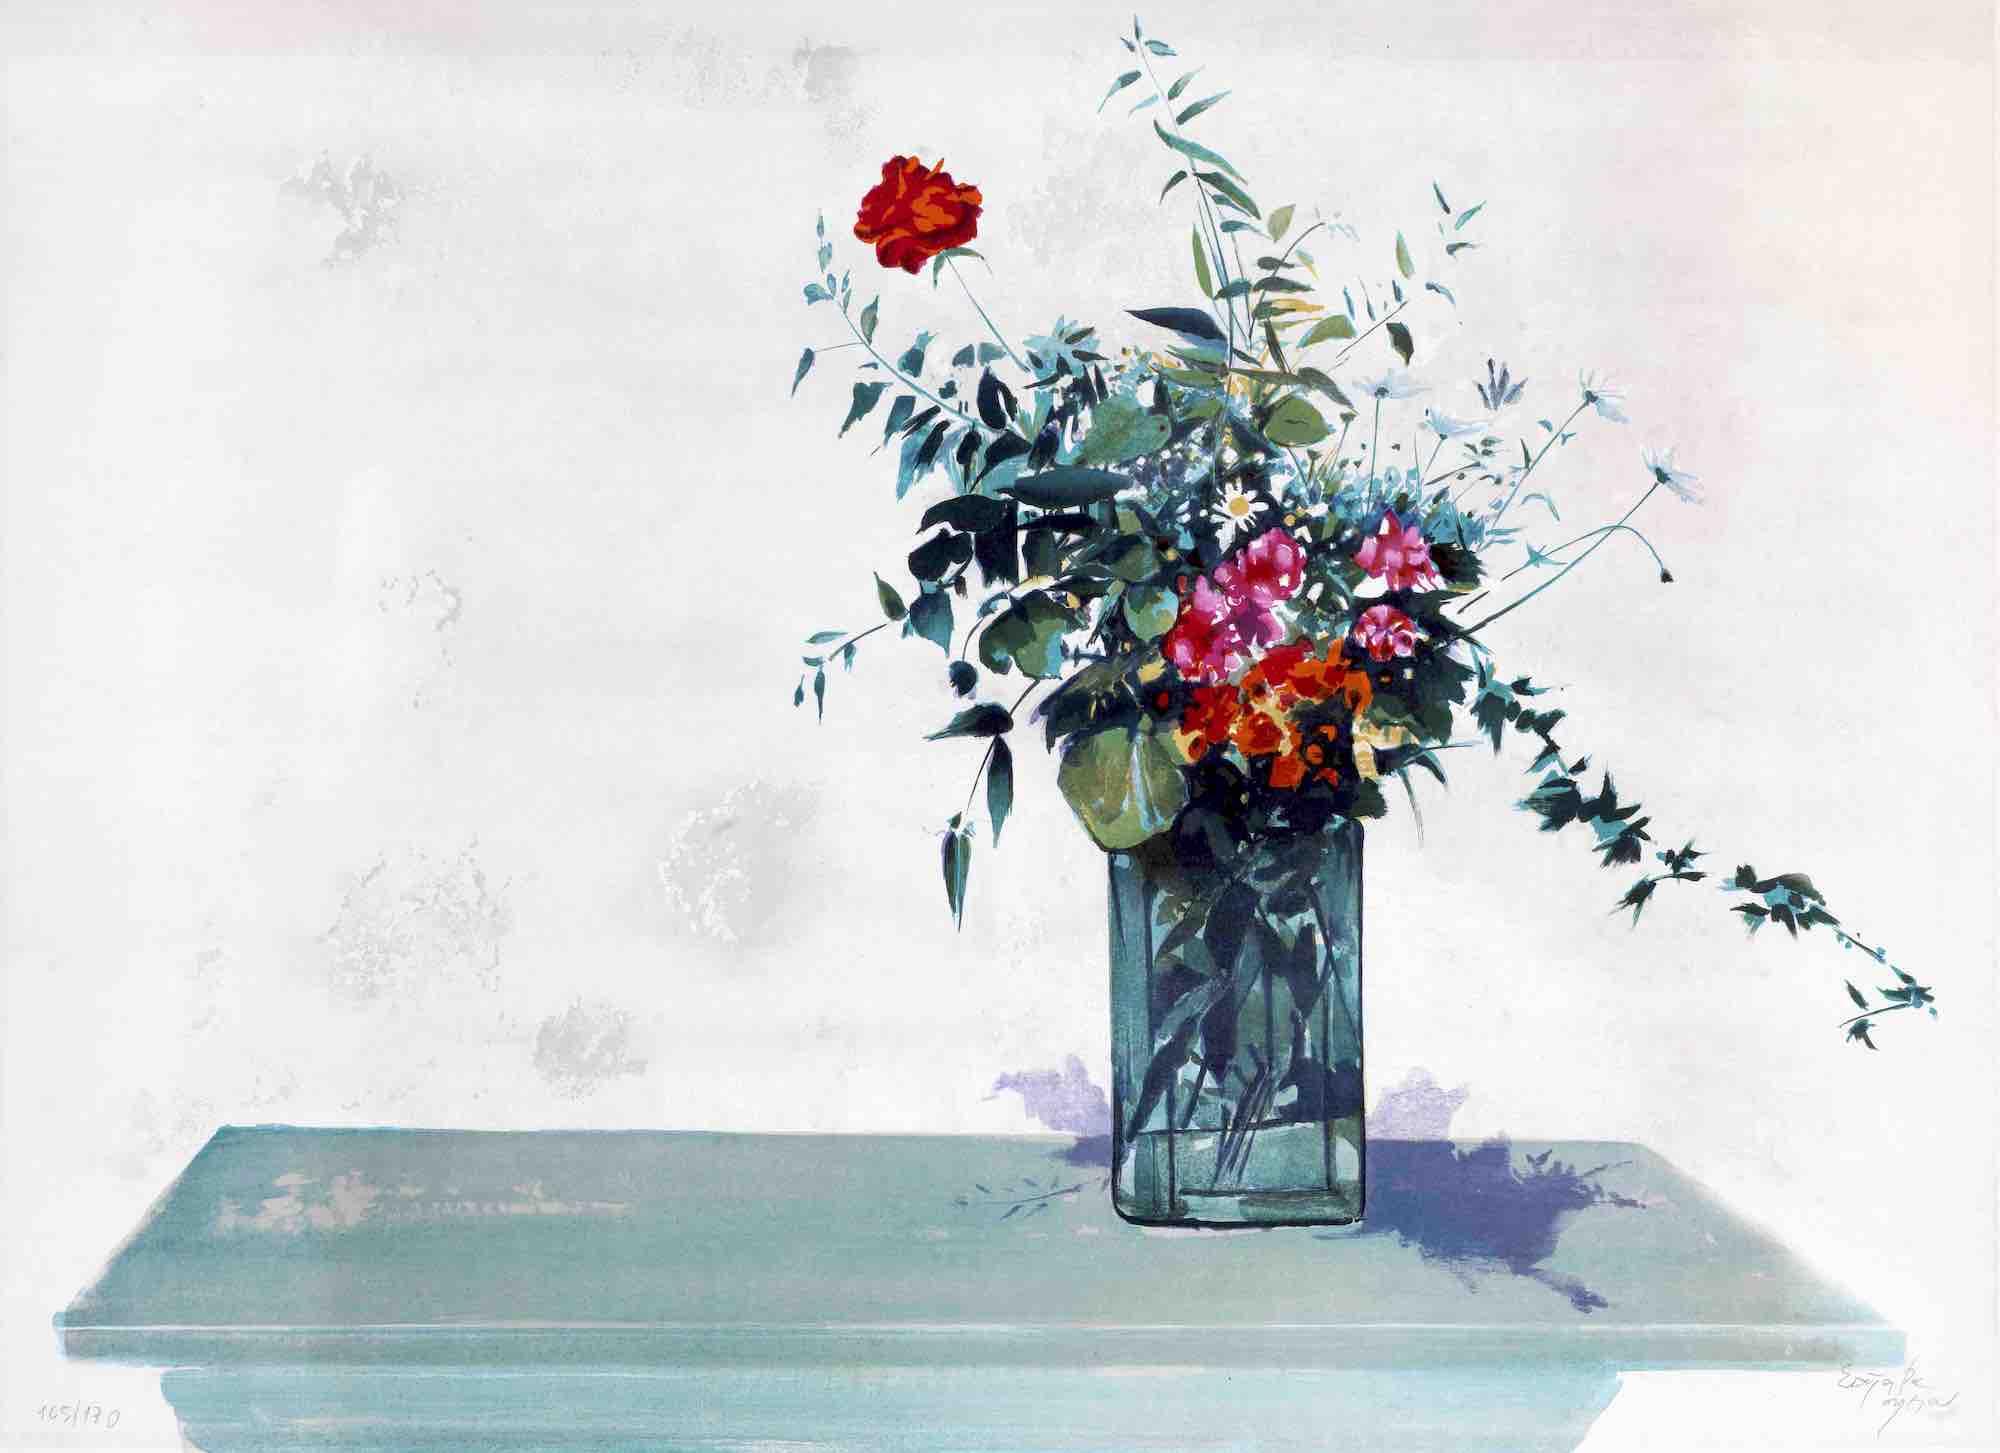 14. Spyros Vassiliou | Vase of flowers